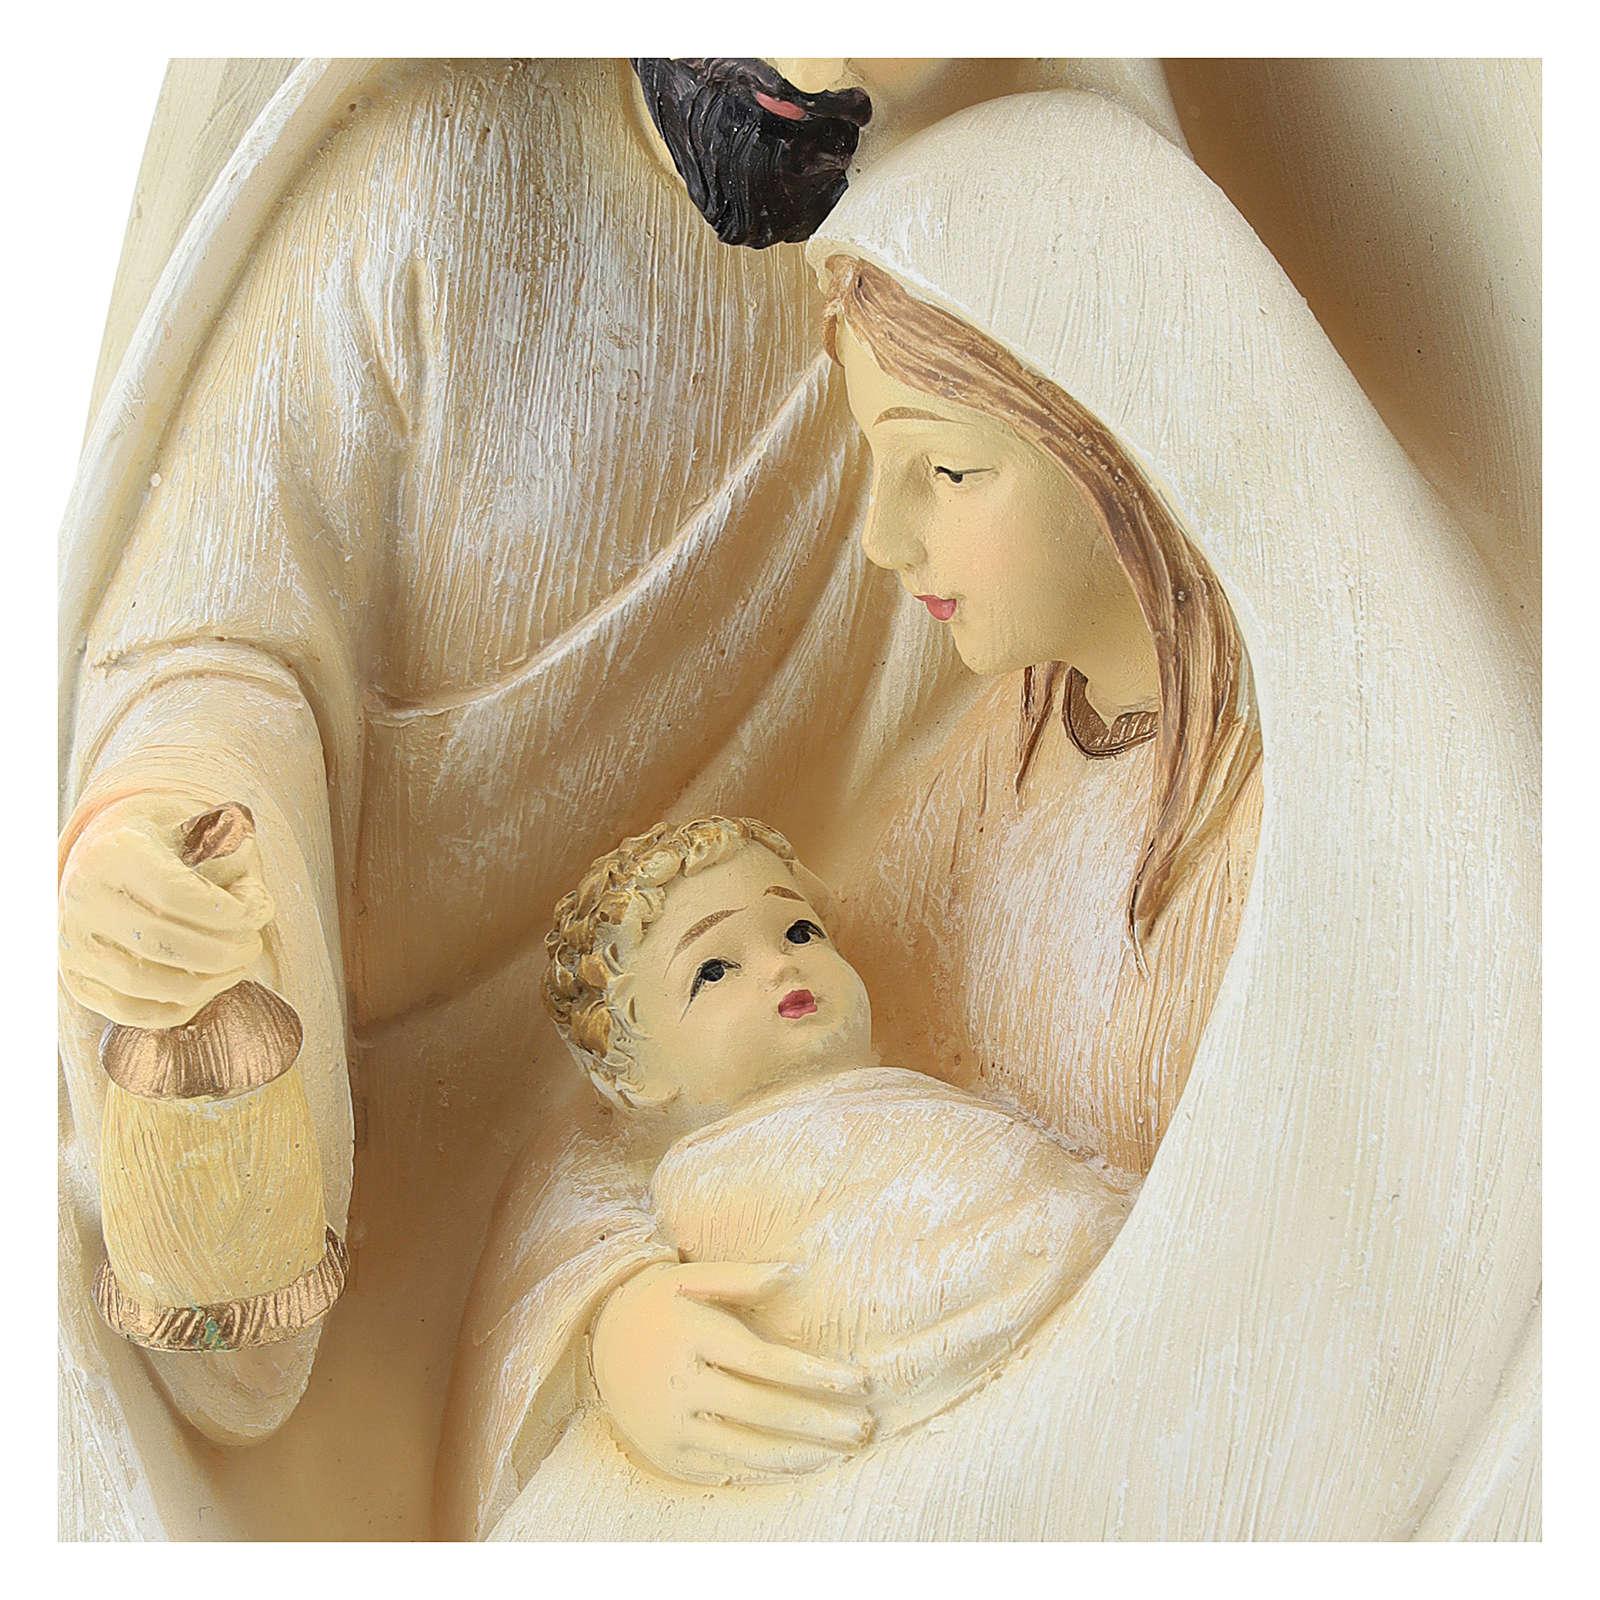 Nativité fond ovale 17 cm résine 3